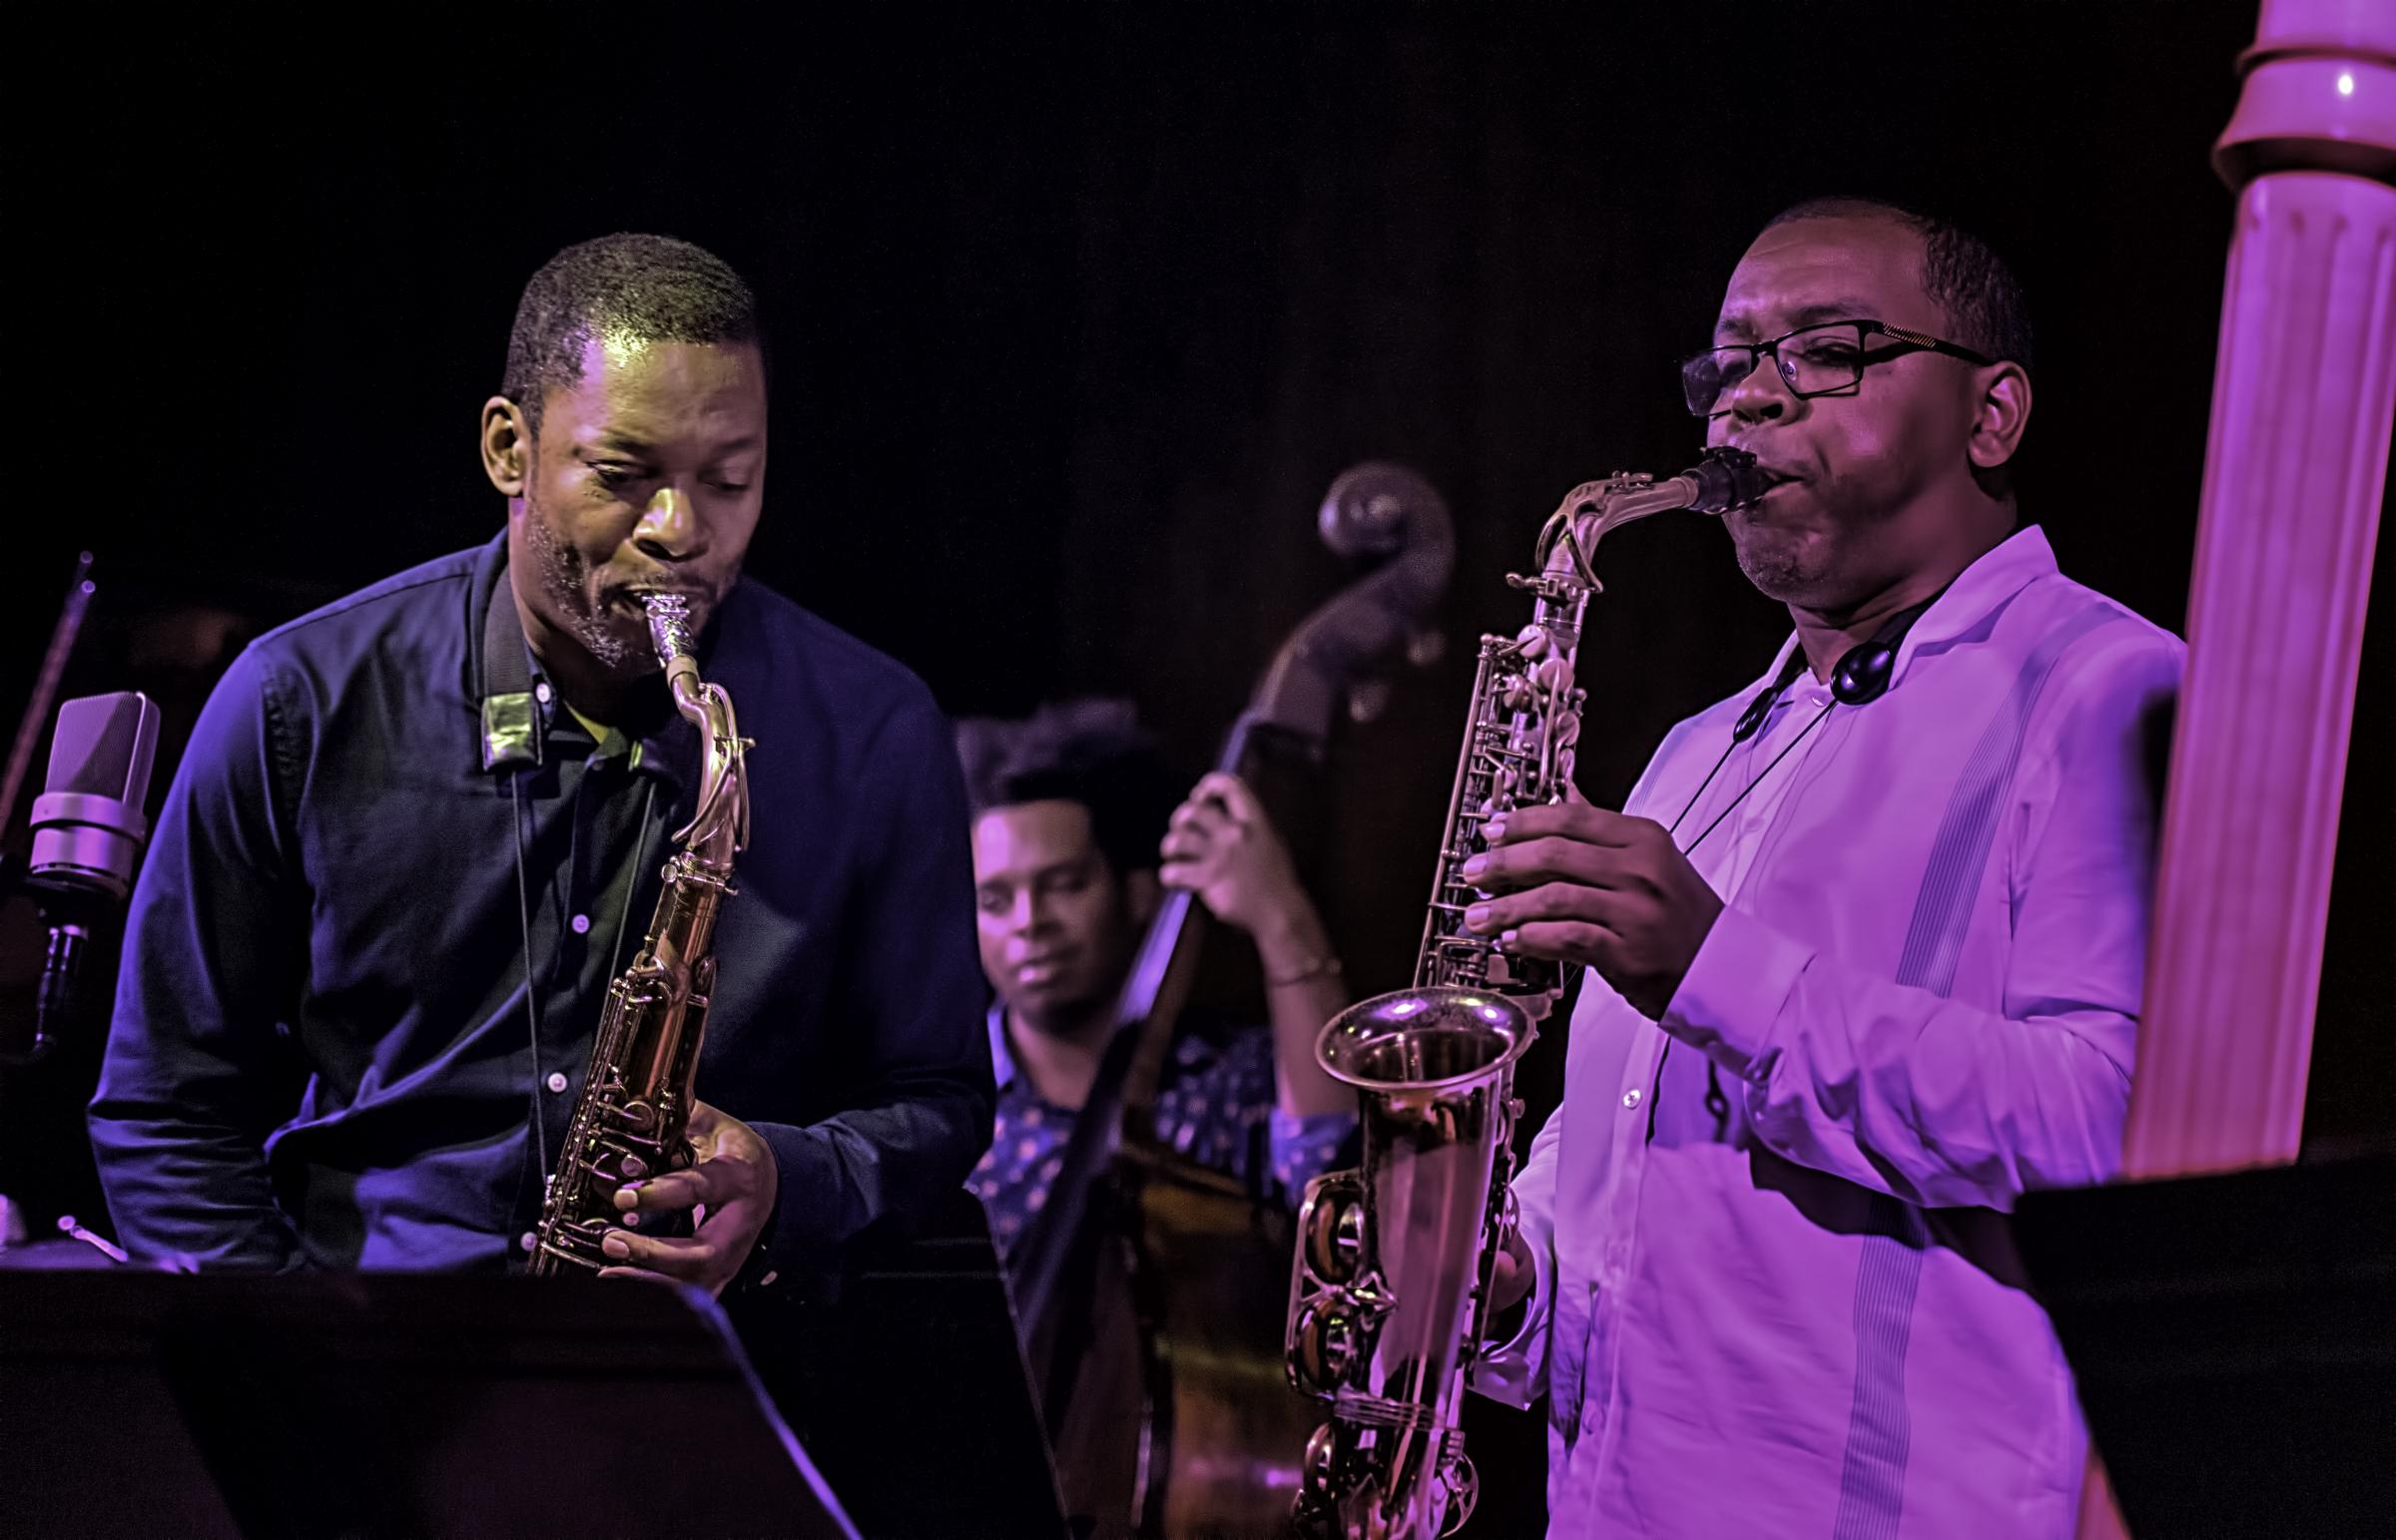 Ravi Coltrane, Rashaan Carter and Roman Filiu with Ravi Coltrane Presents Universal Consciousness: Melodic Meditations of Alice Coltrane at the Jazz Gallery